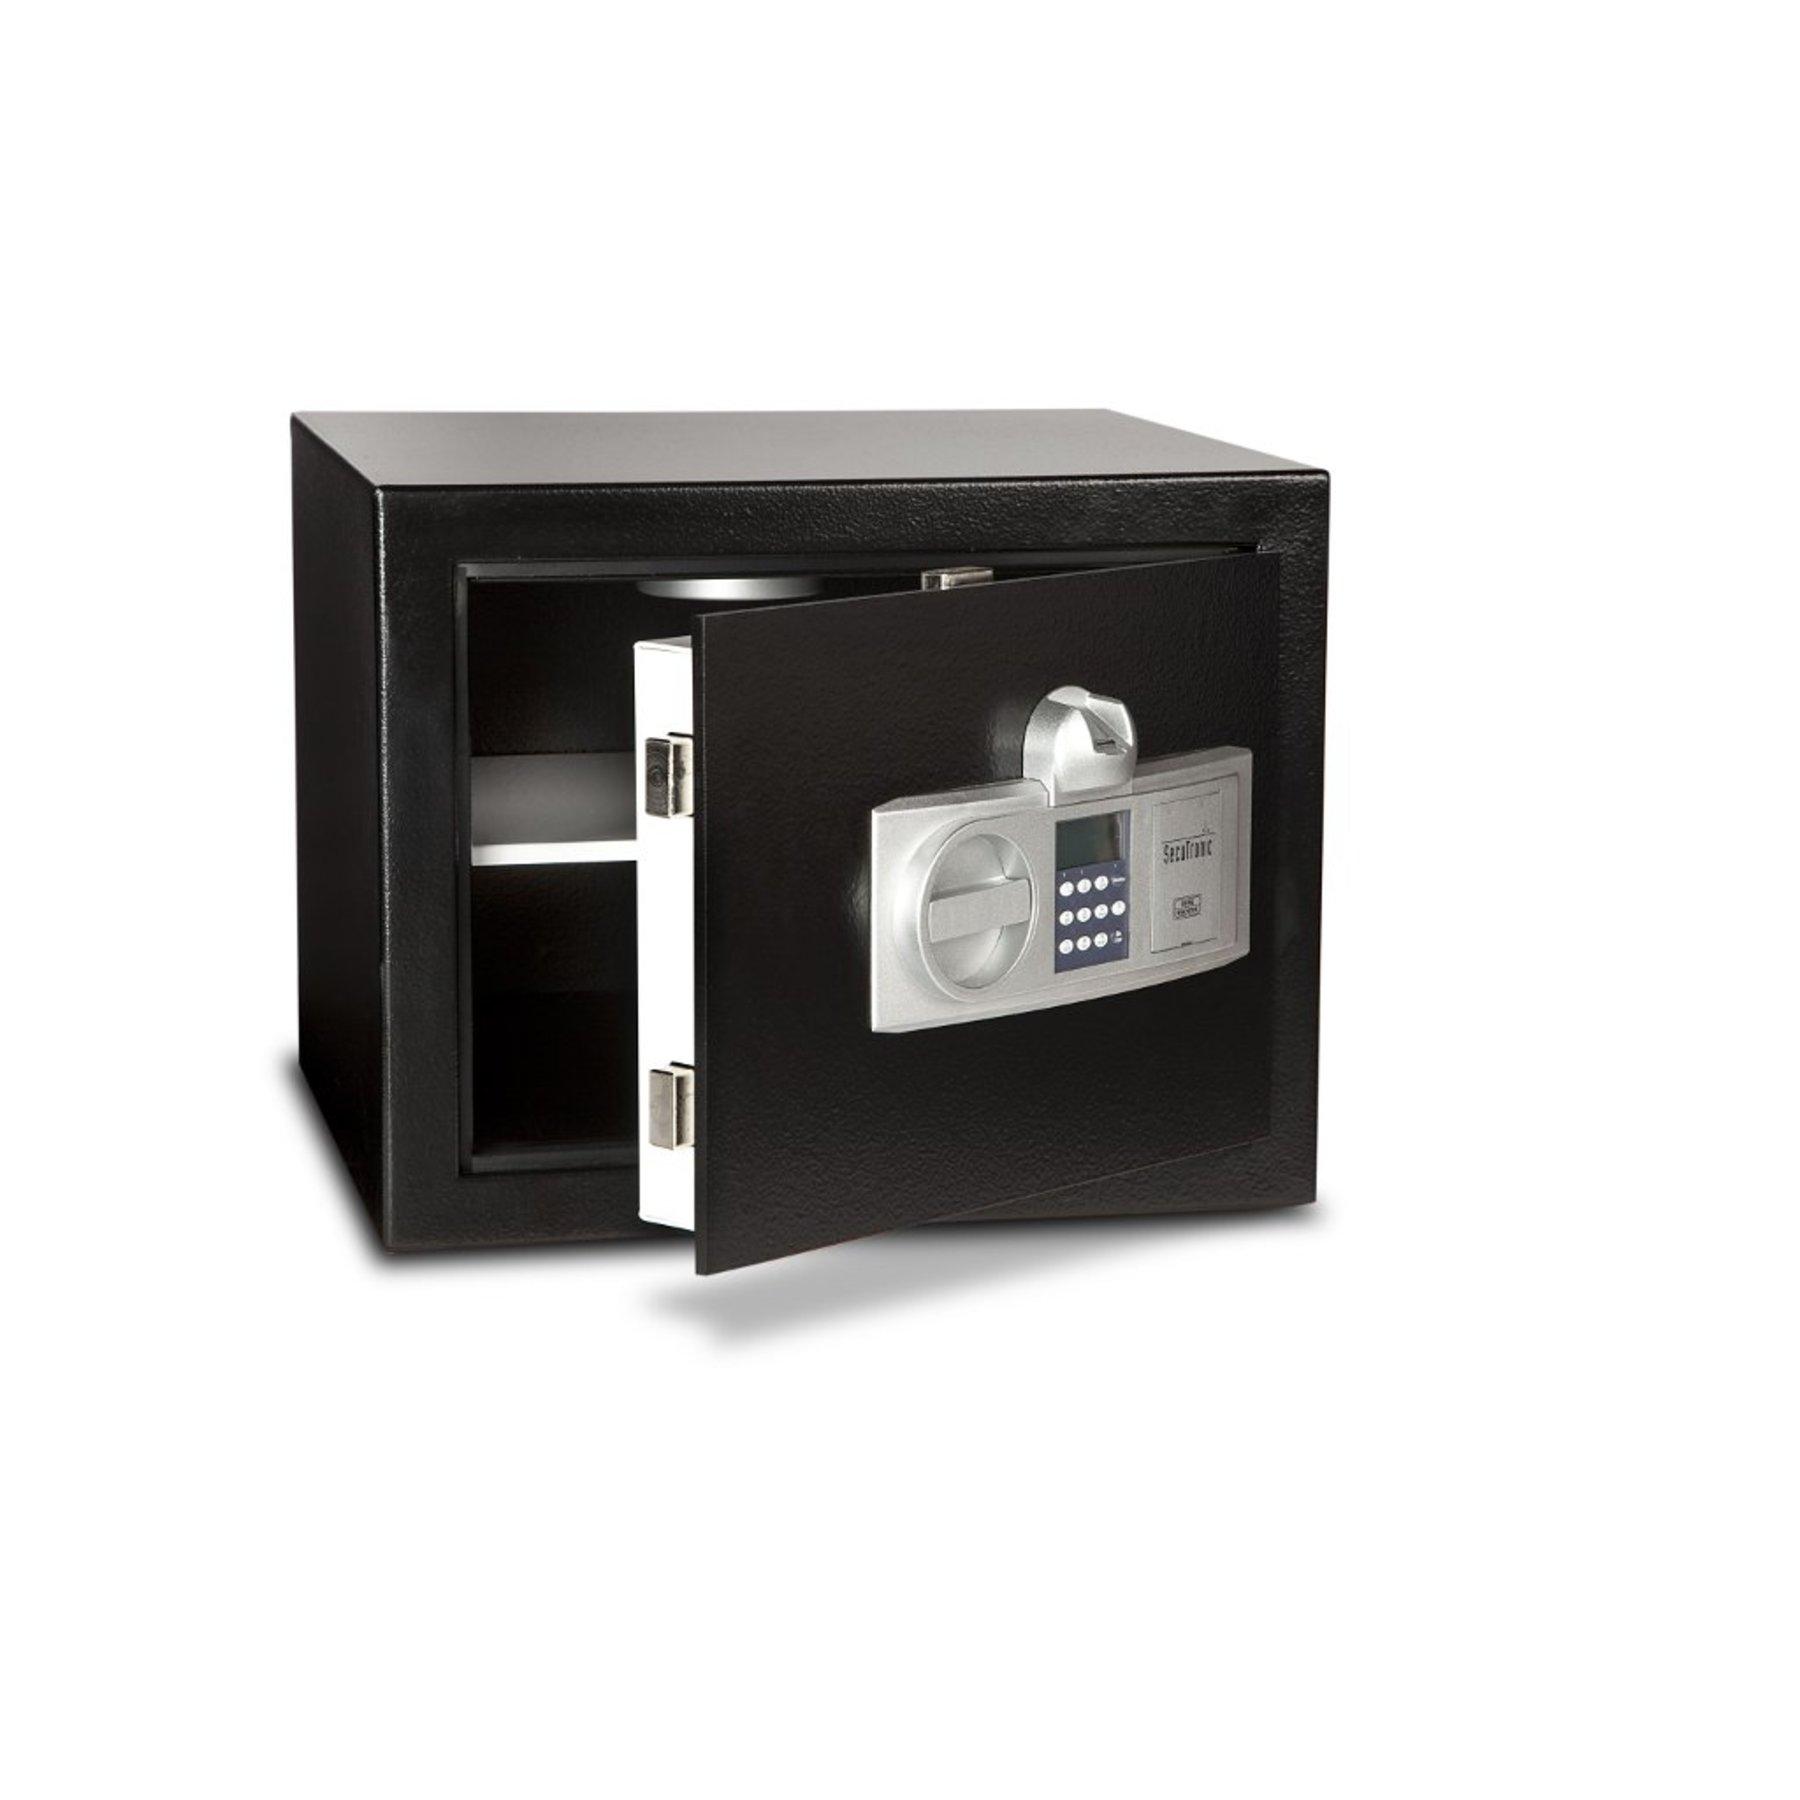 Burton Biosec 6000-1 Biometric Safe